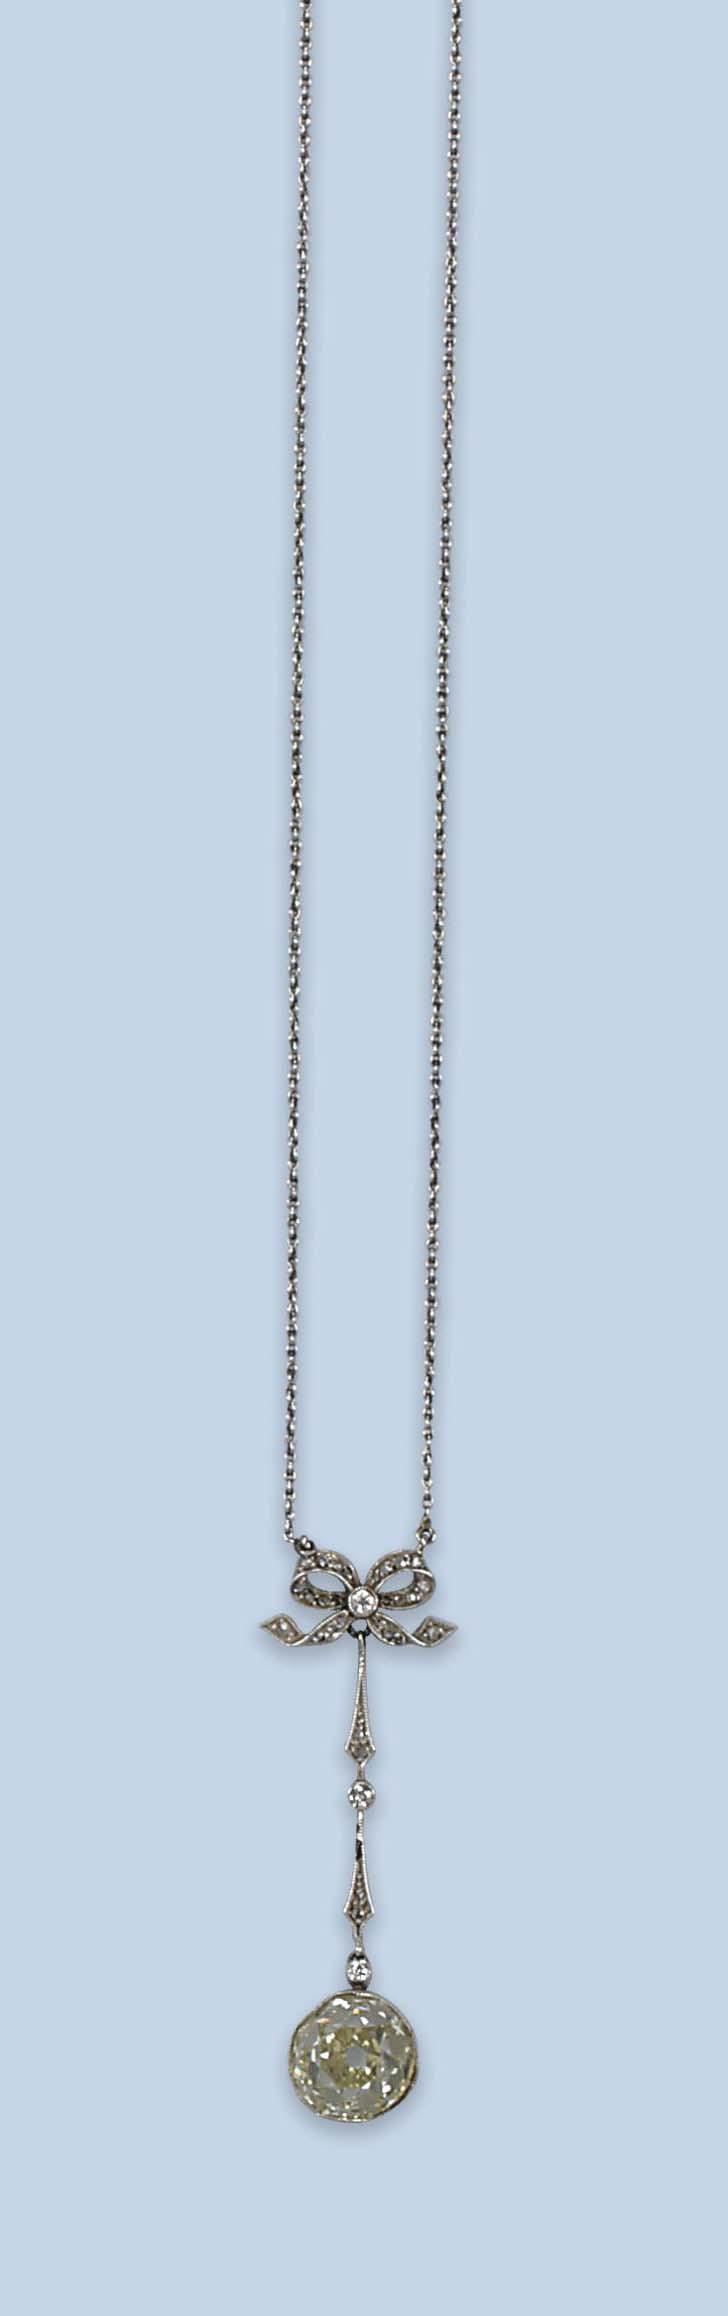 A BELLE EPOQUE DIAMOND NECKLACE, BY BONEBAKKER